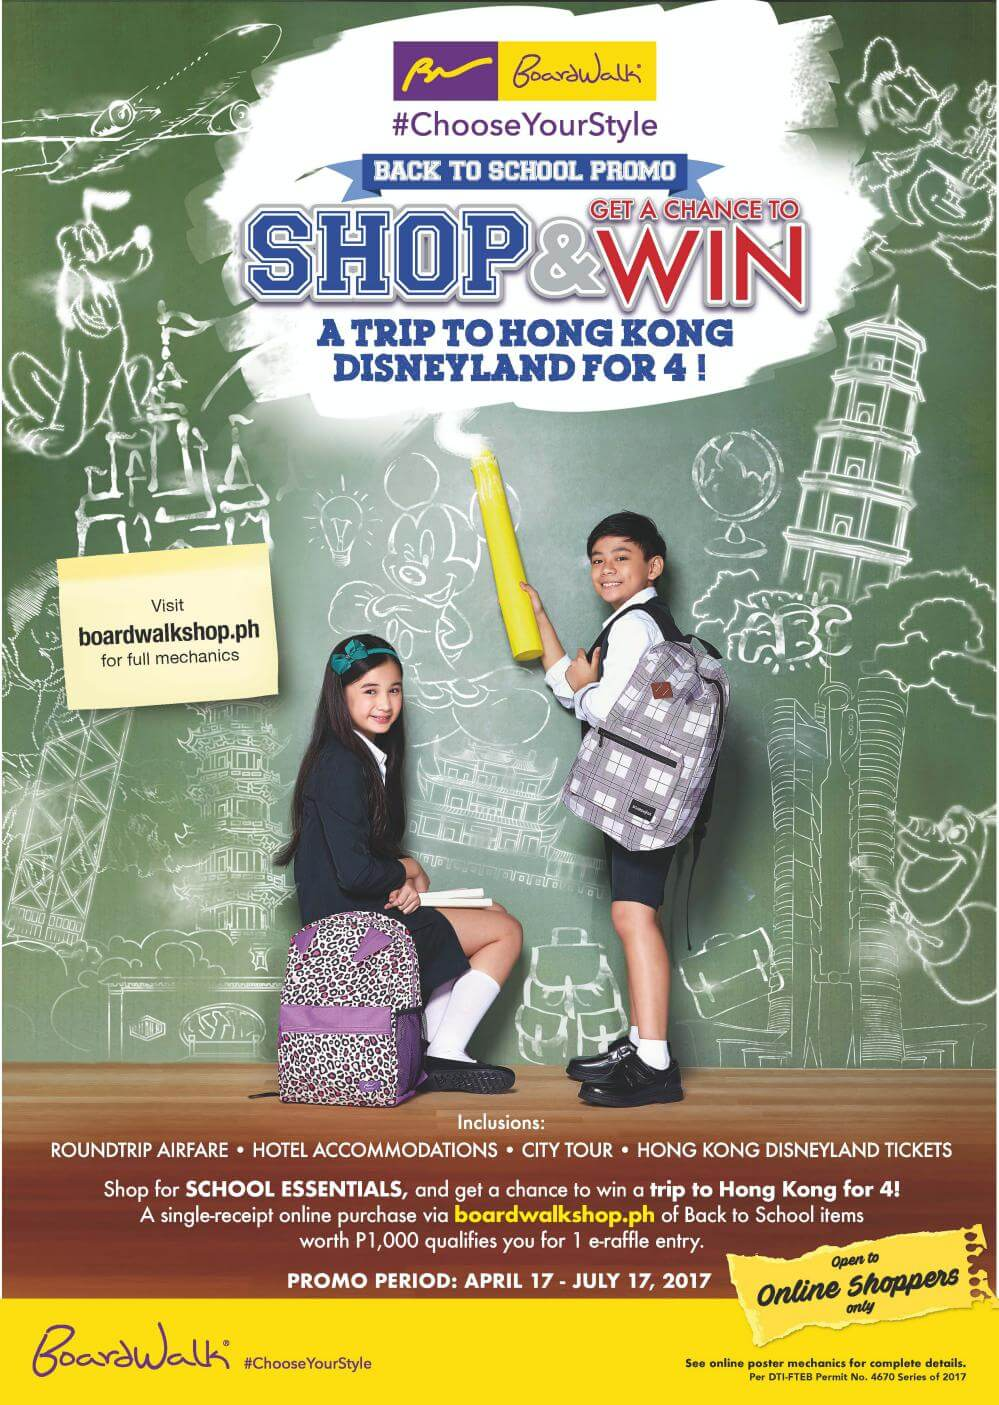 Boardwalk's Shop and Win a Trip to HongKong Disneyland